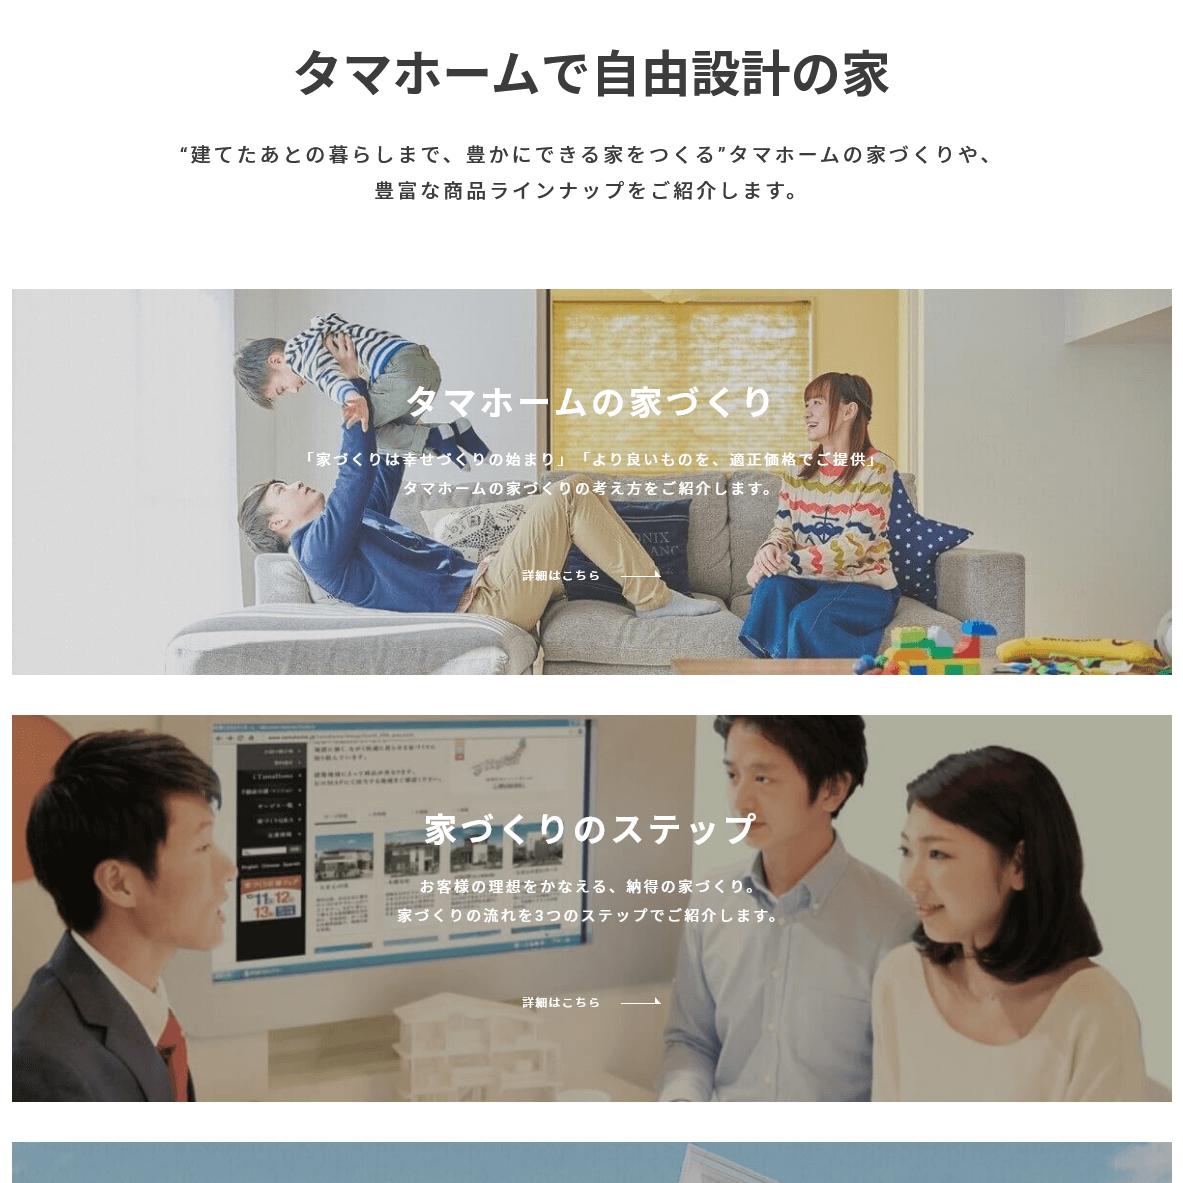 "<span class=""title"">タマホームの口コミや評判</span>"